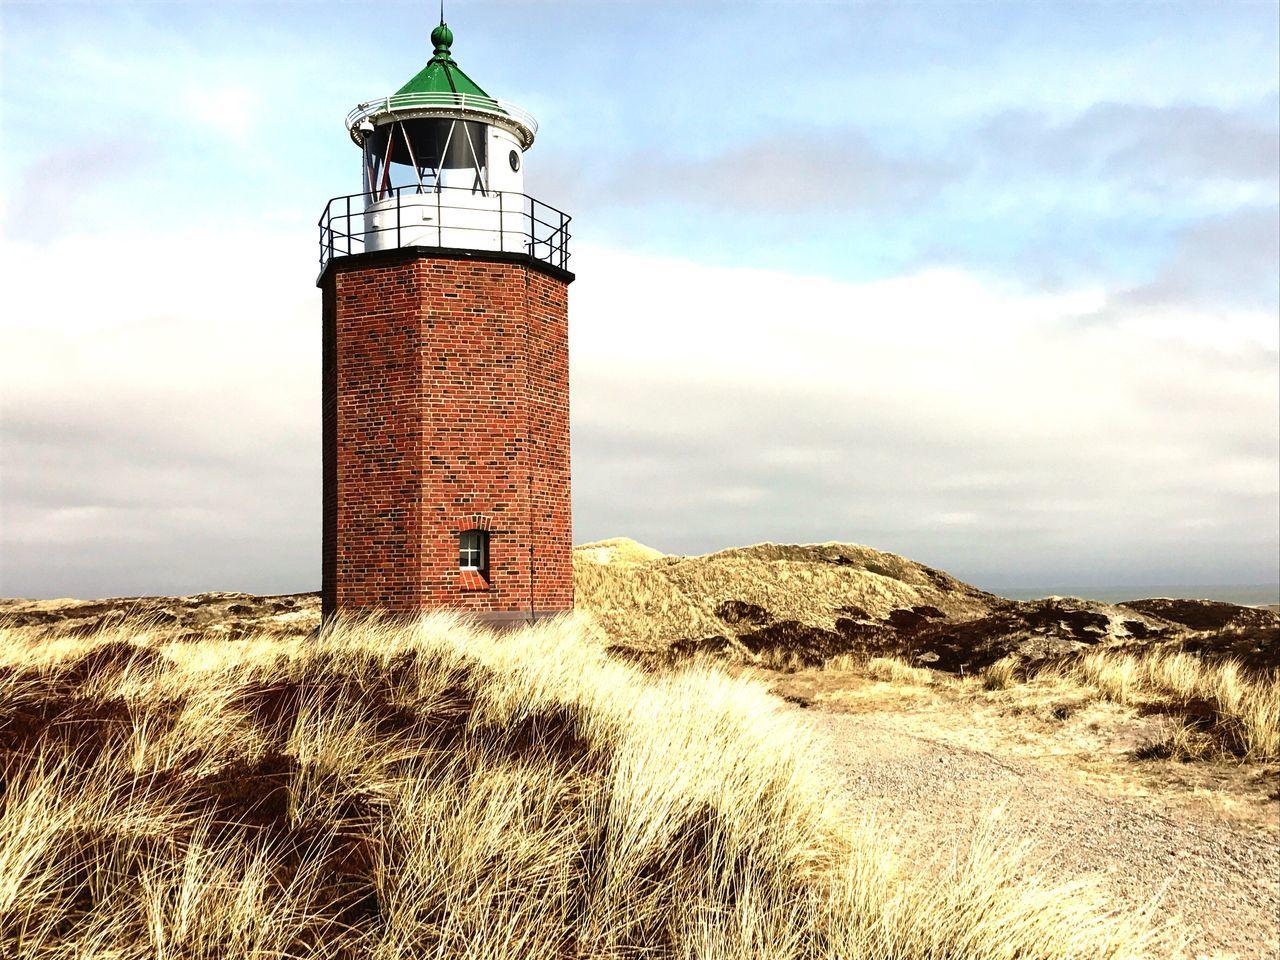 Sylt Quermarkenfeuer LEUCHTTURM Outdoors Sea Lighthouse Architecture